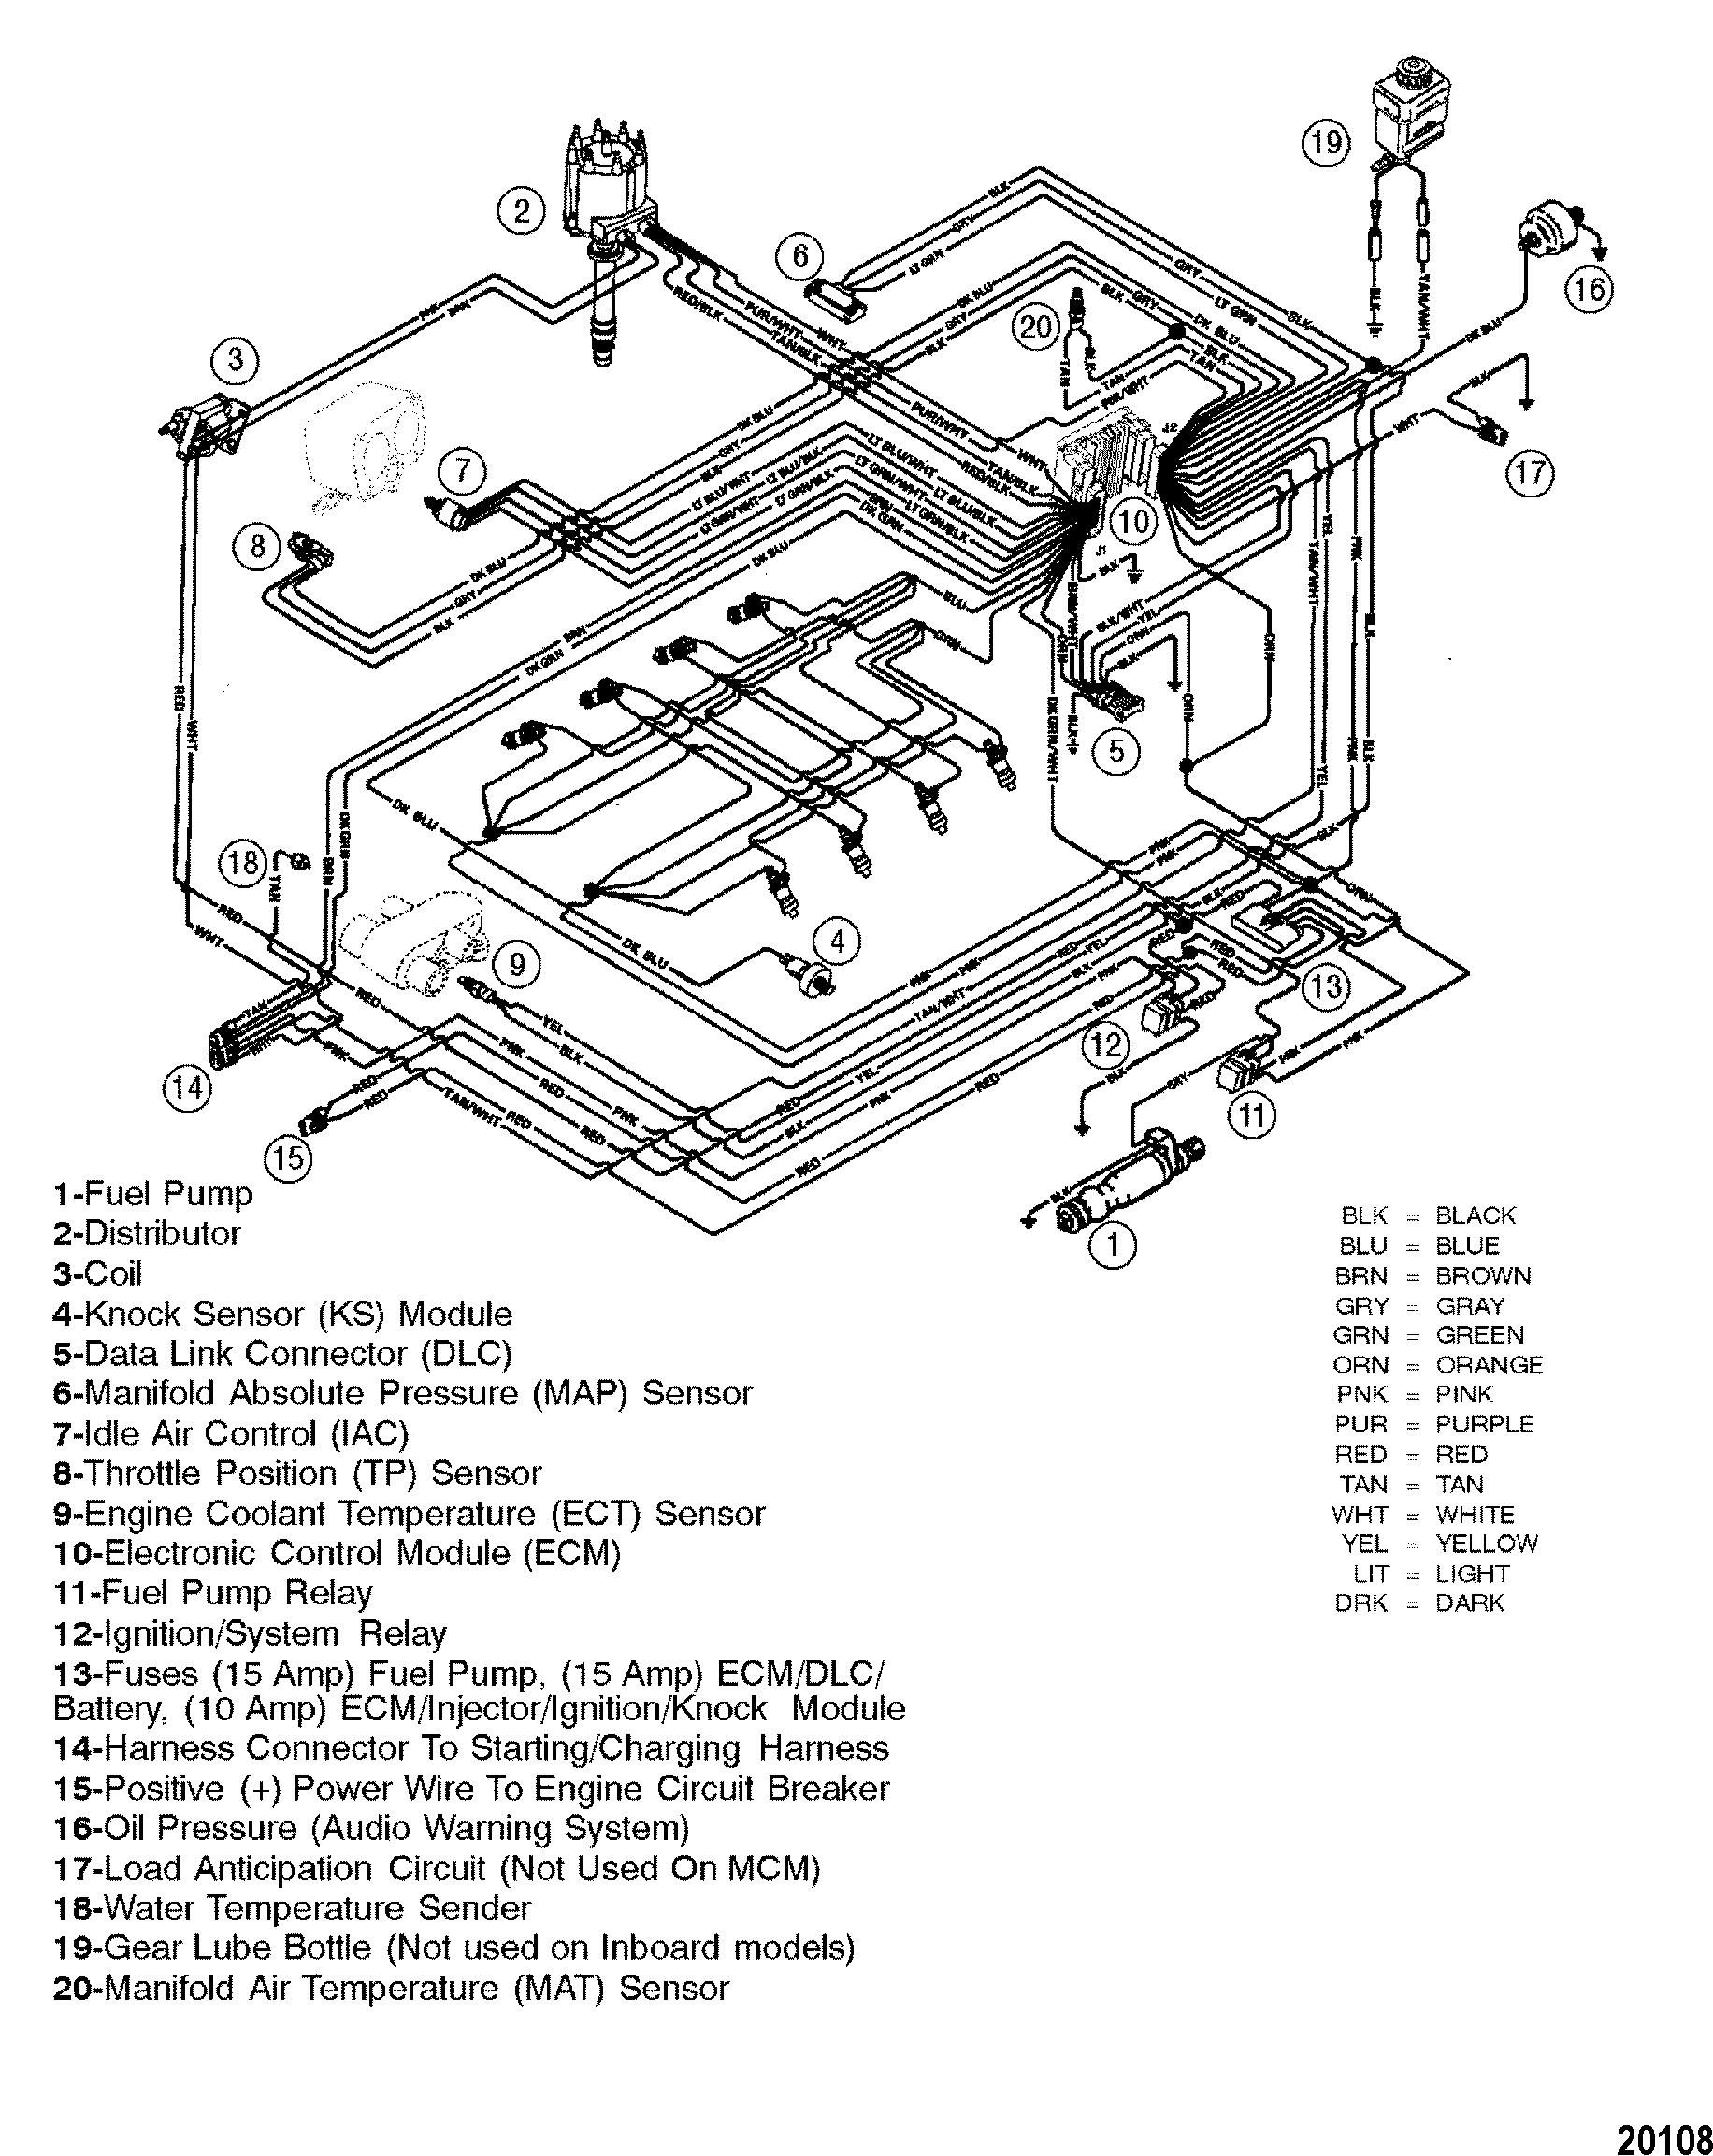 CP Performance - Wiring Harness (EFI)